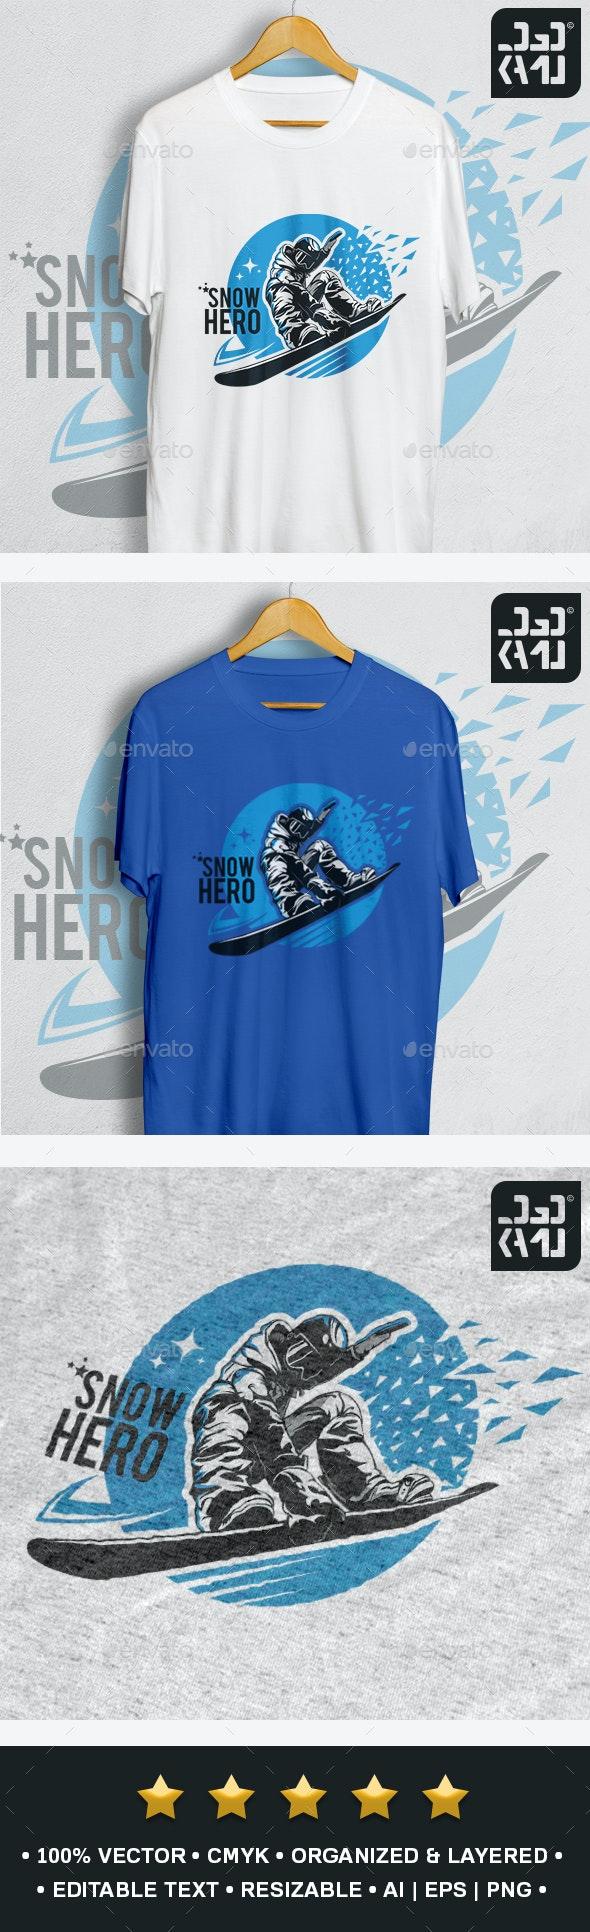 Snow Hero T-Shirt - Sports & Teams T-Shirts